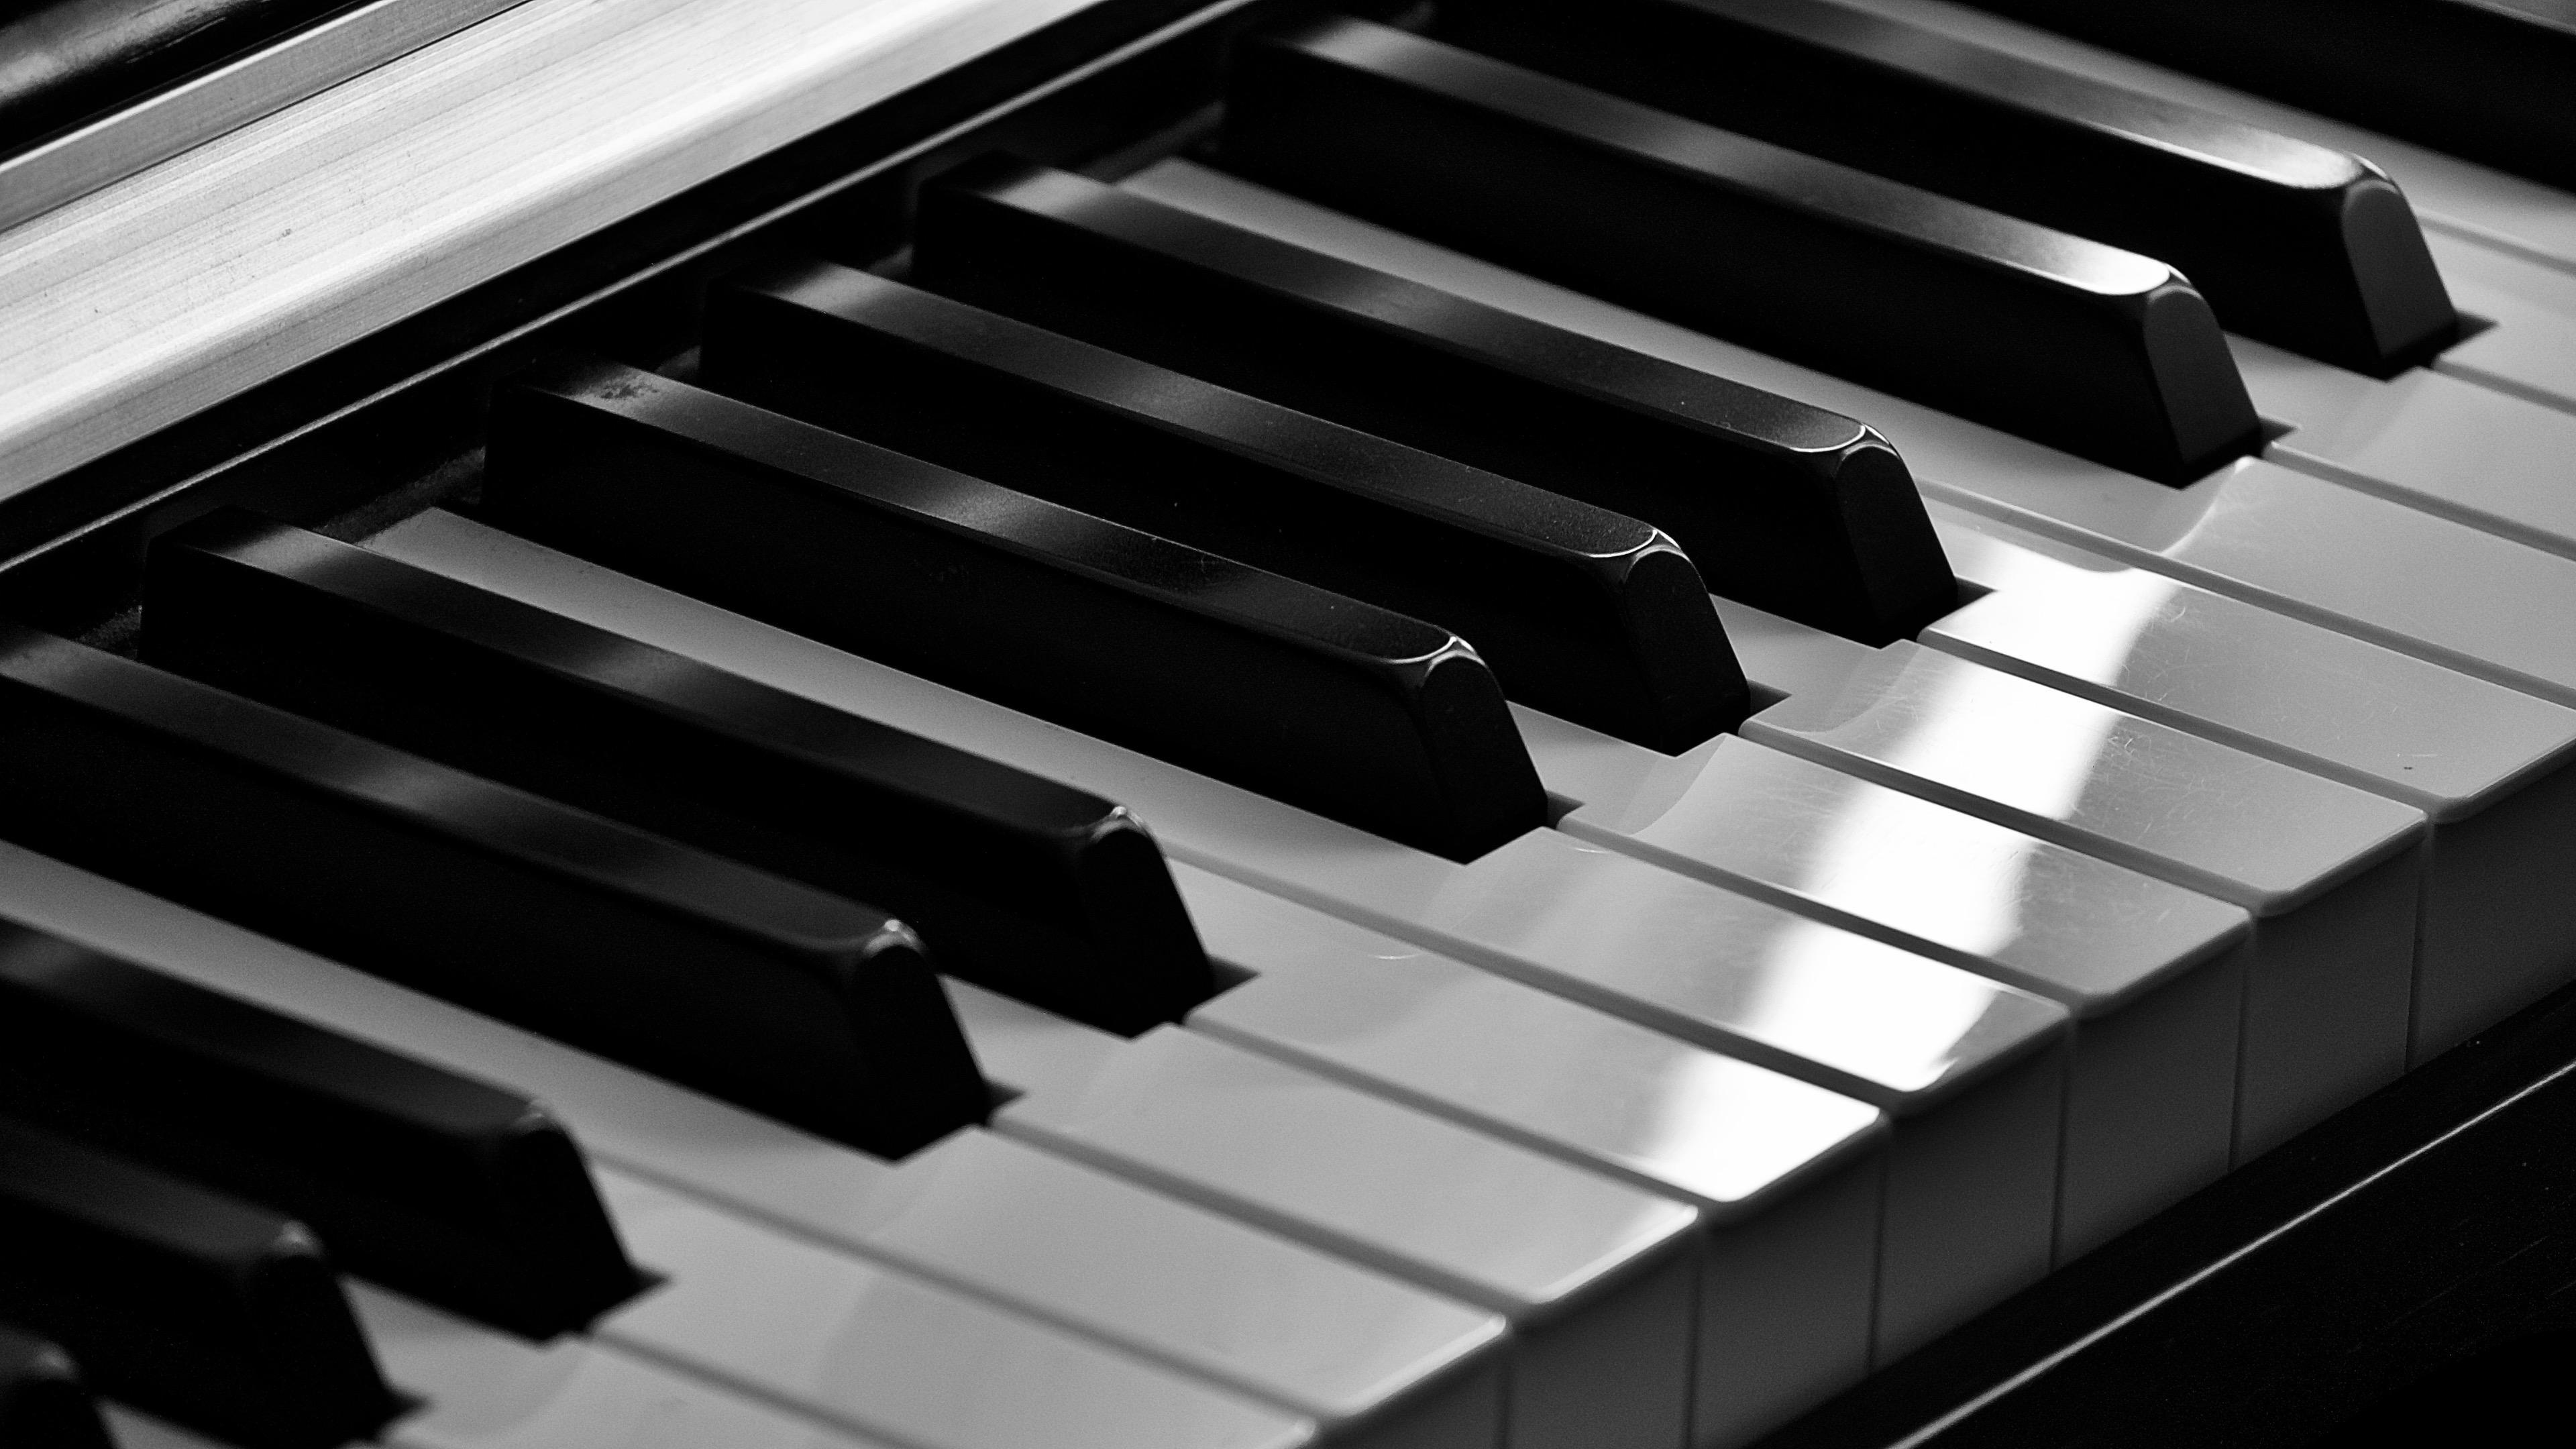 piano key wallpaper